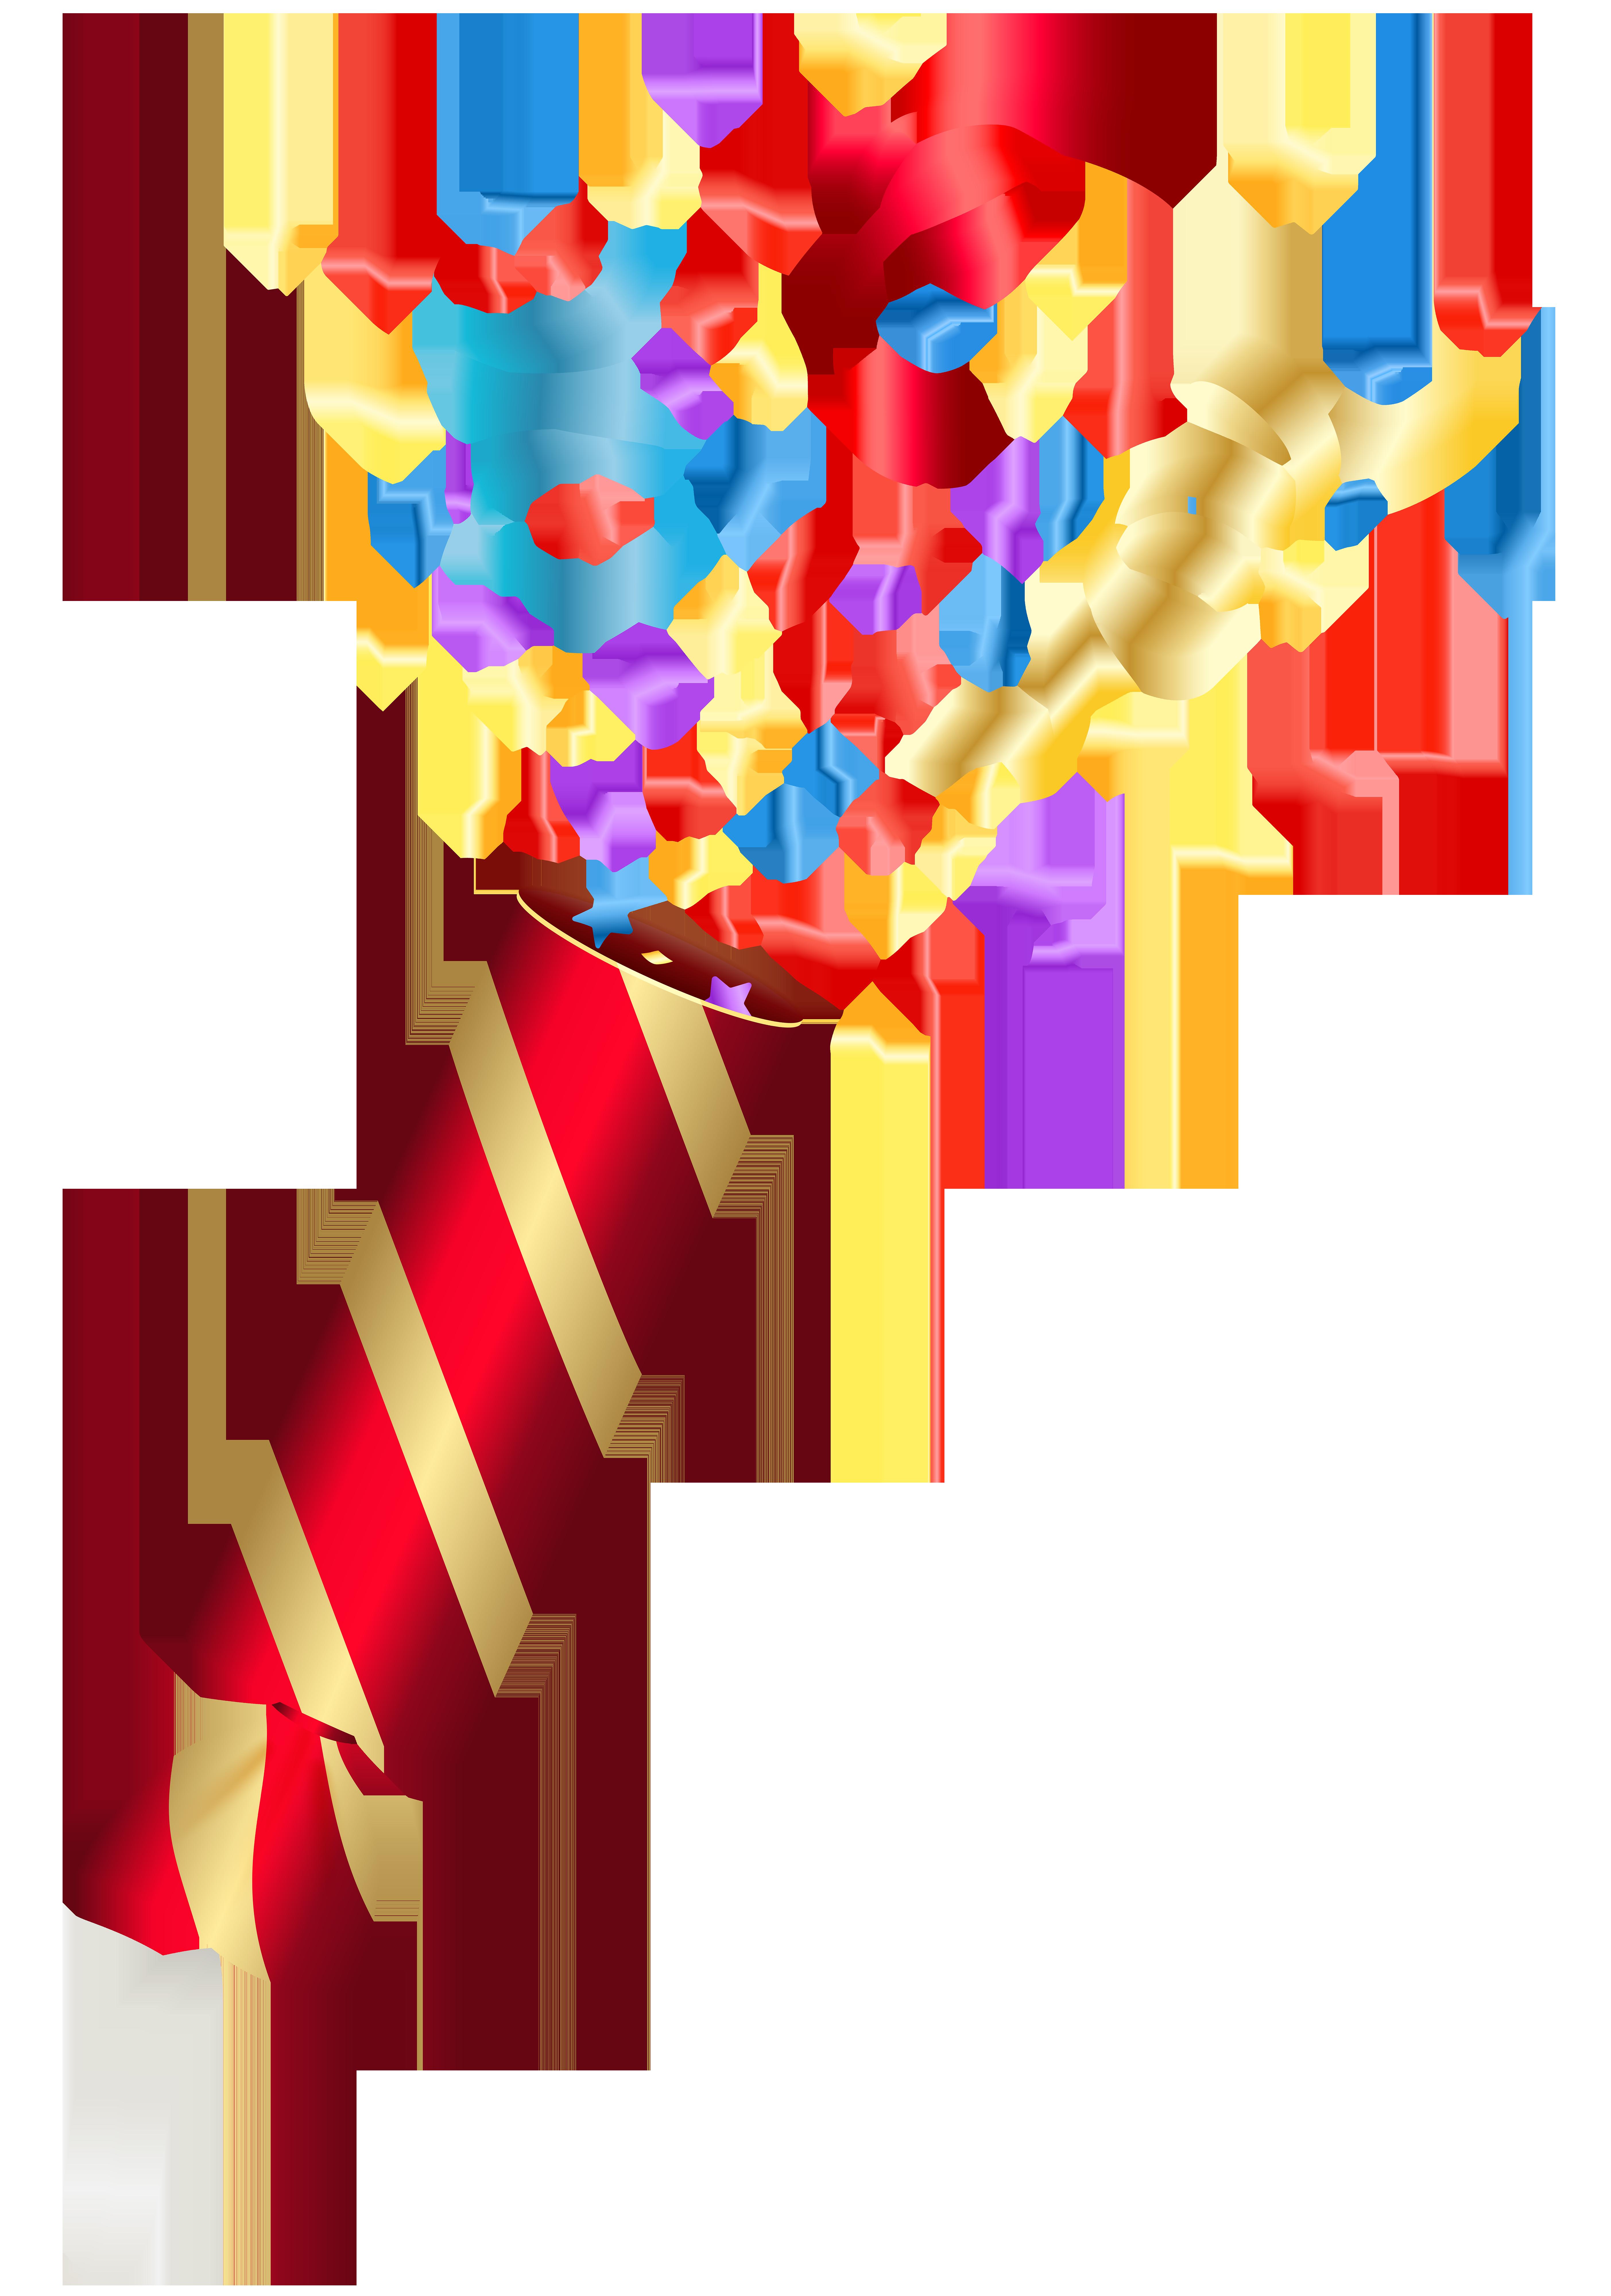 Party Confetti PNG Clip Art Image.